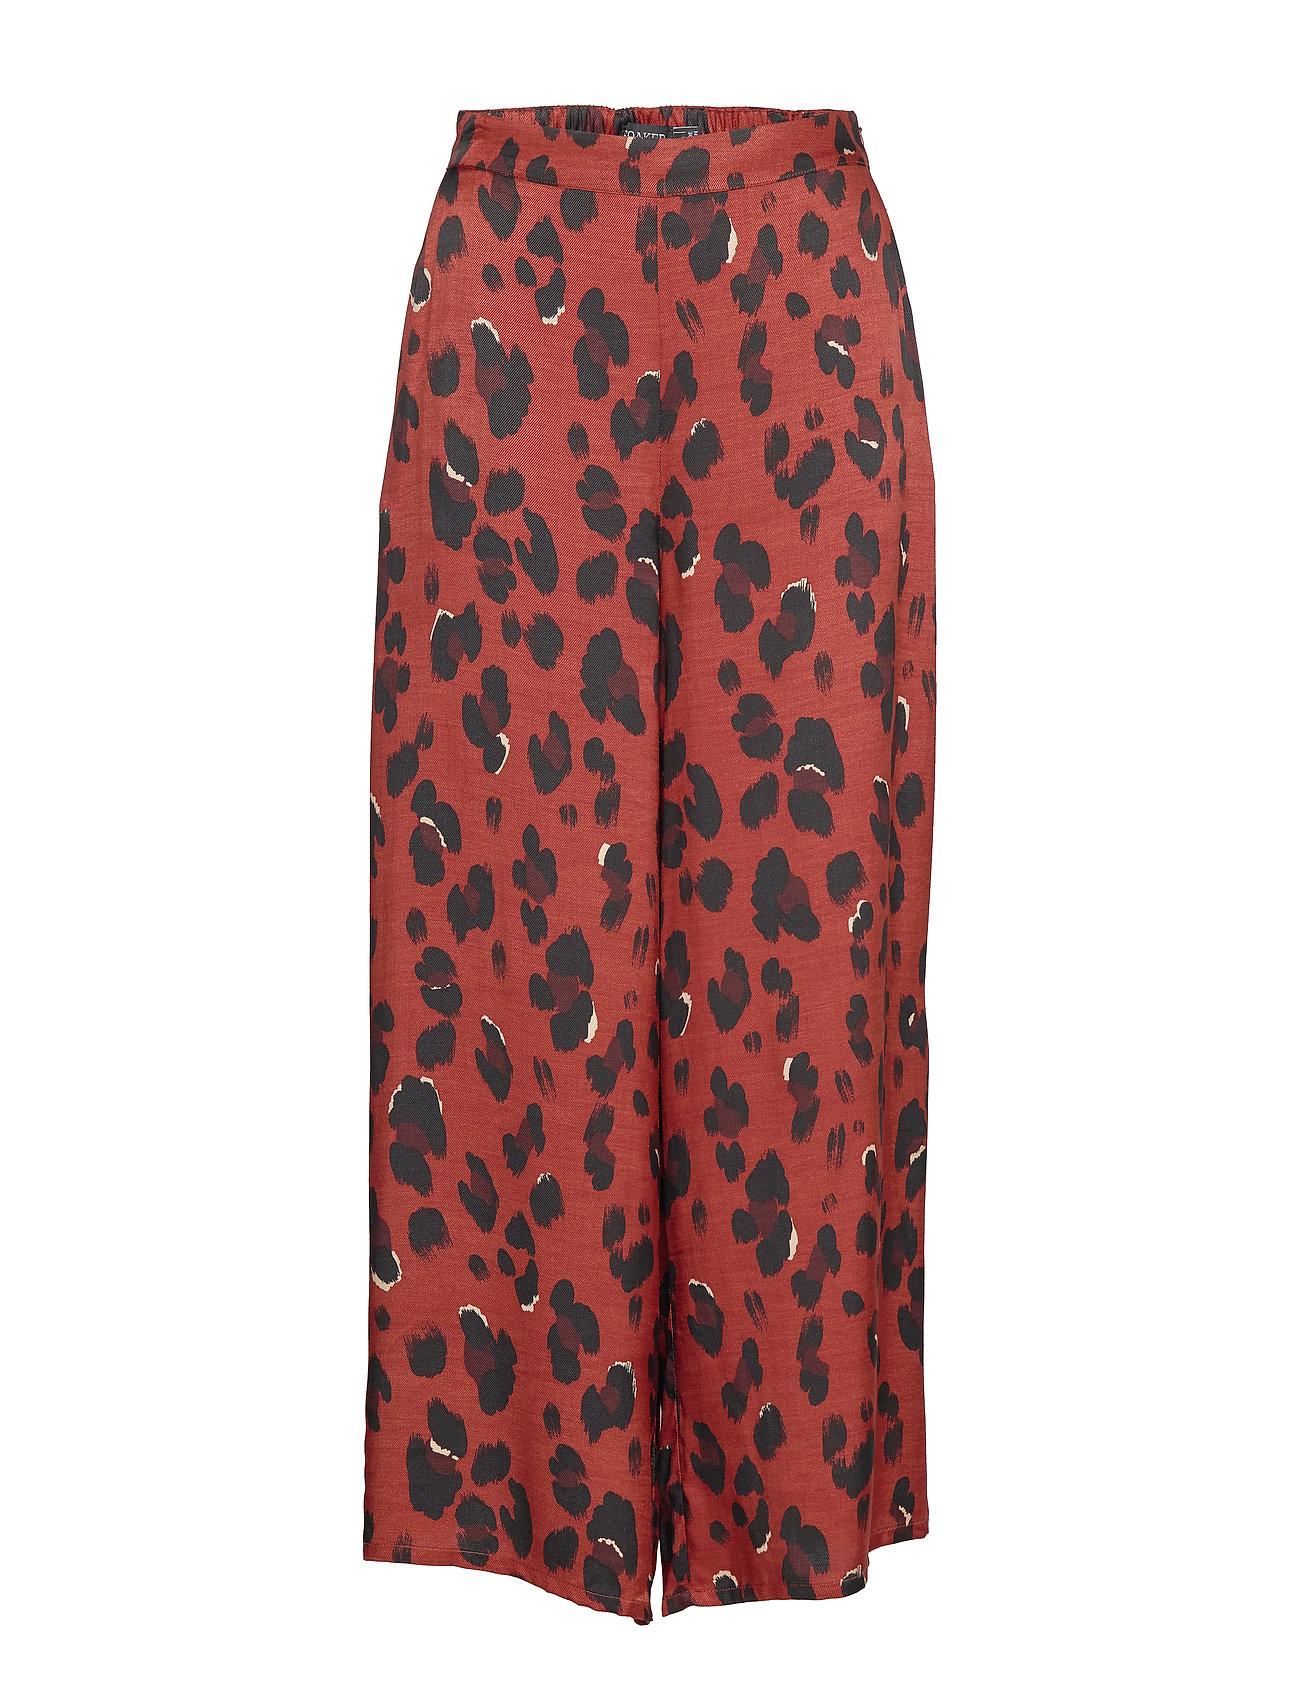 Soaked in Luxury SL Maxwell Pants - BURNT HENNA LEOPARD